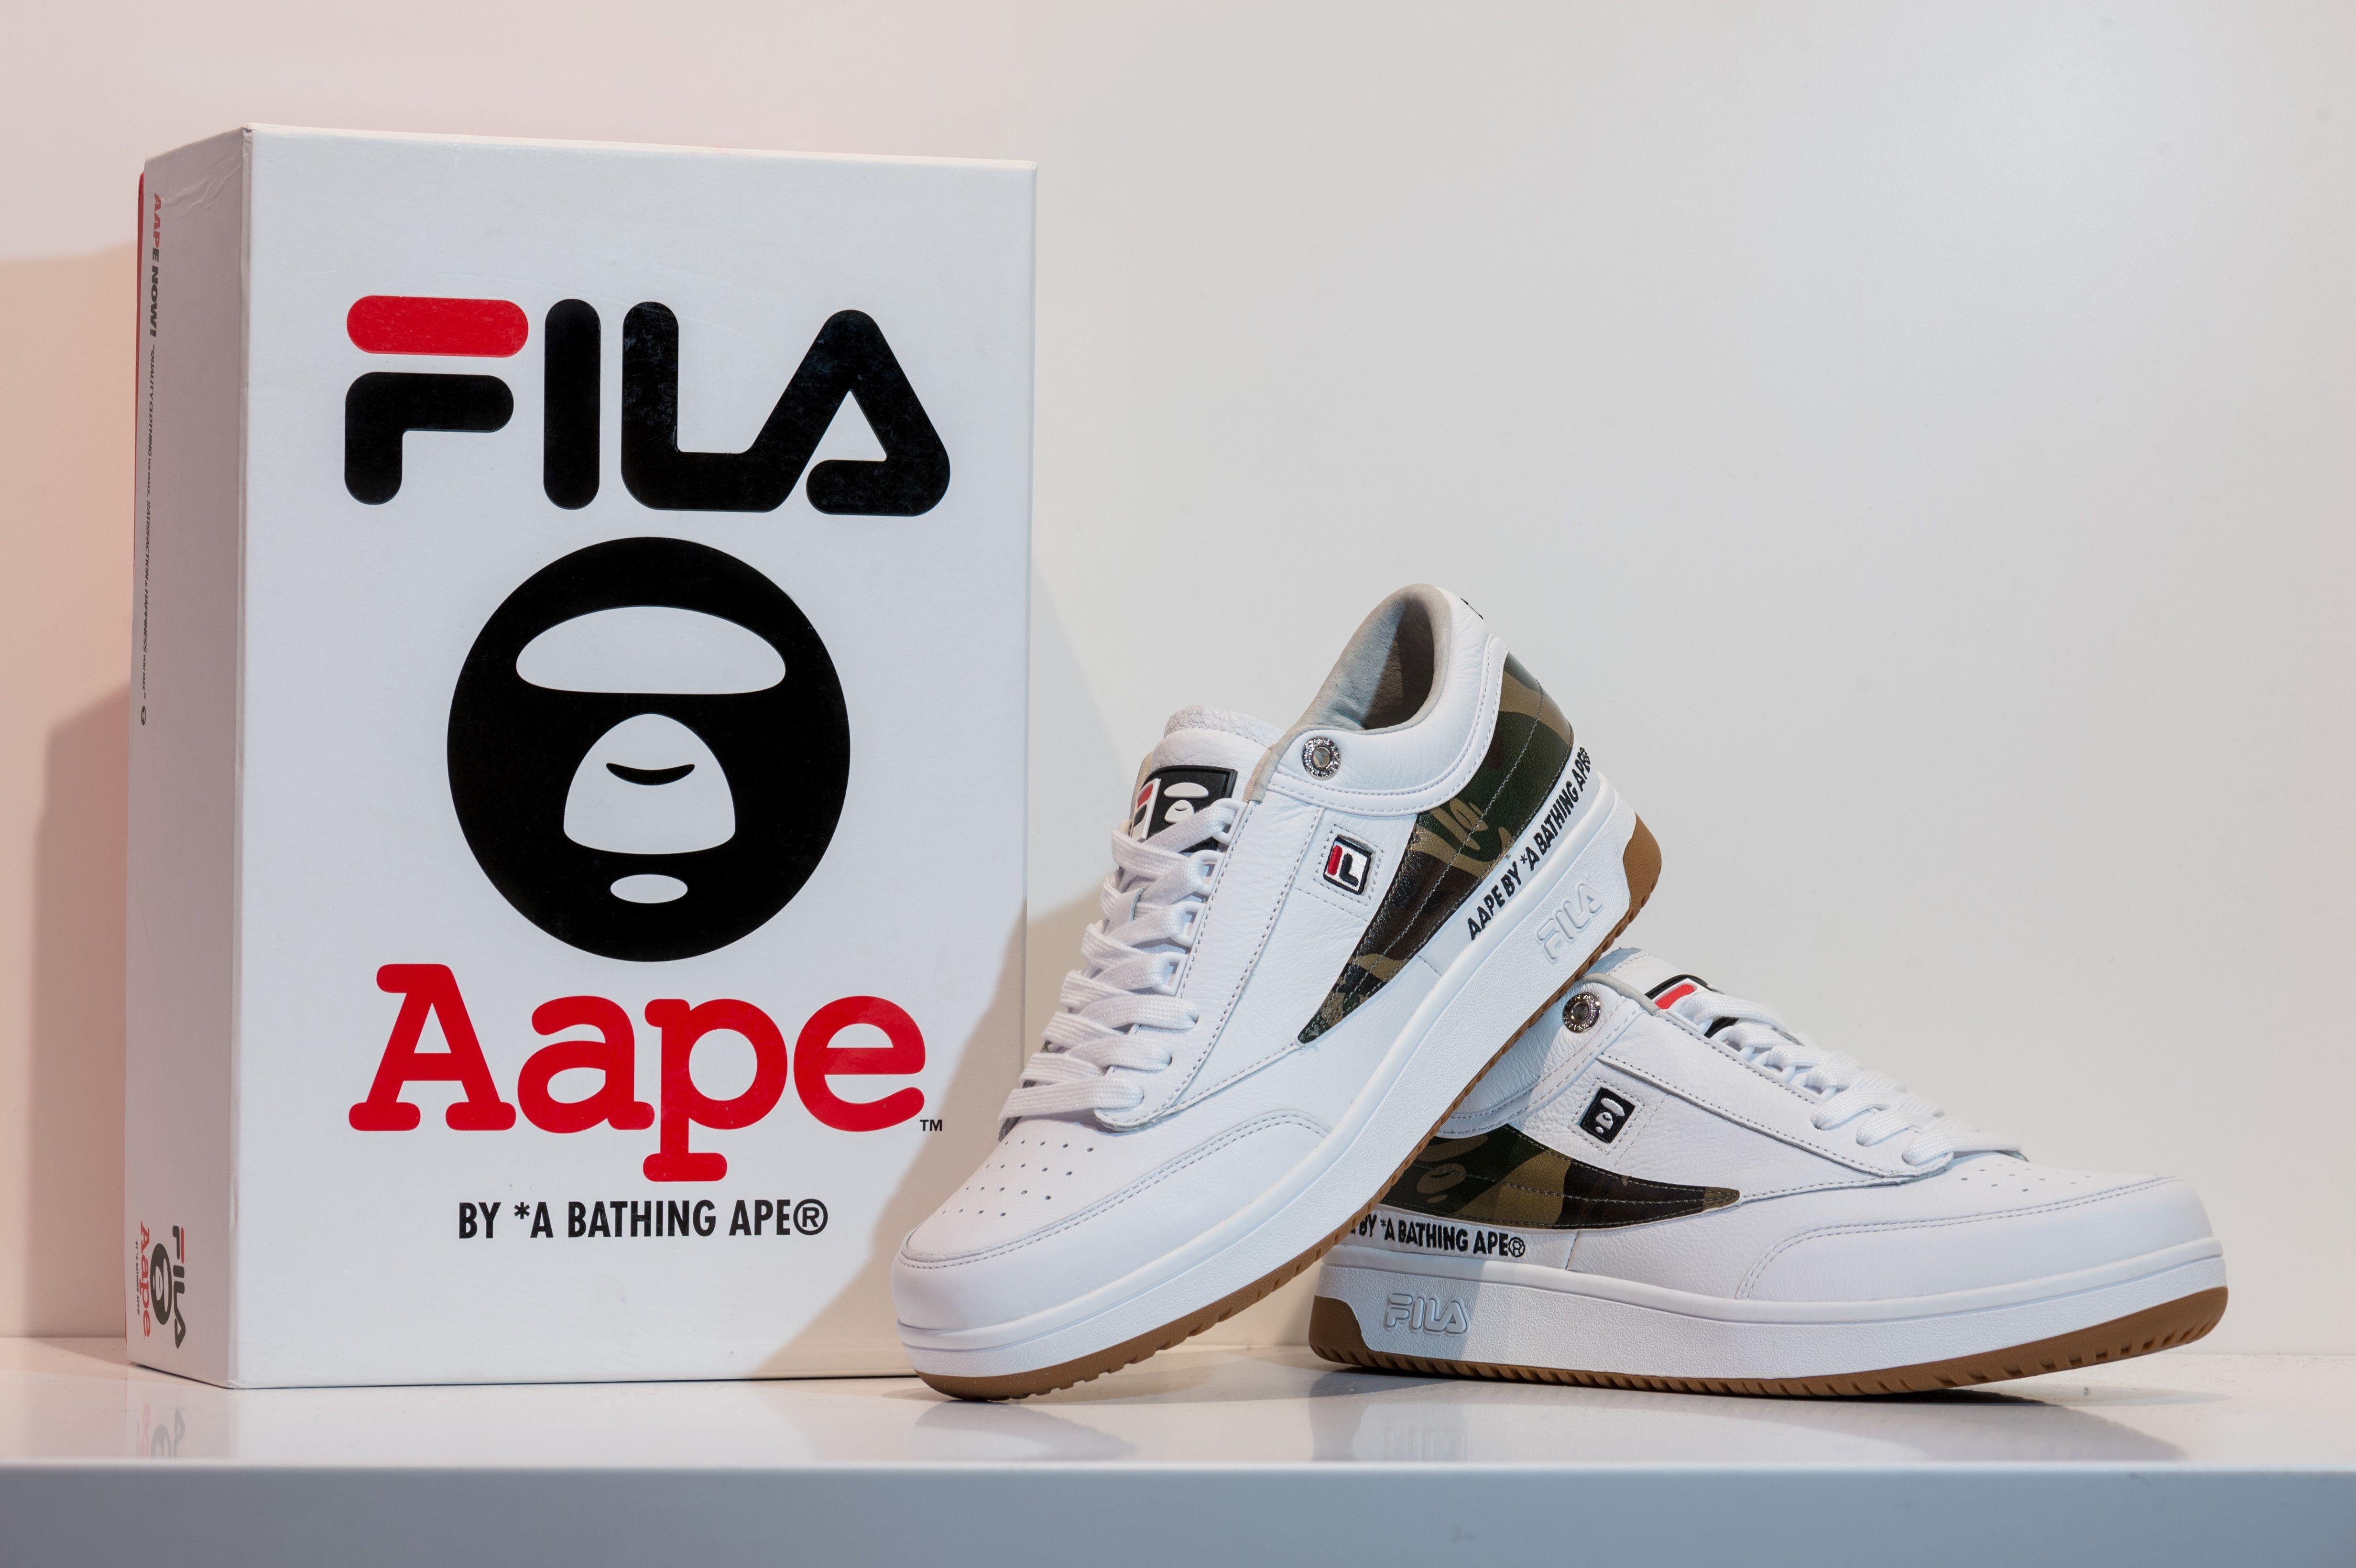 4f3f5106 AAPE by A Bathing Ape x FILA T-1 Mid Sneakers | Original Nike Shoes ...